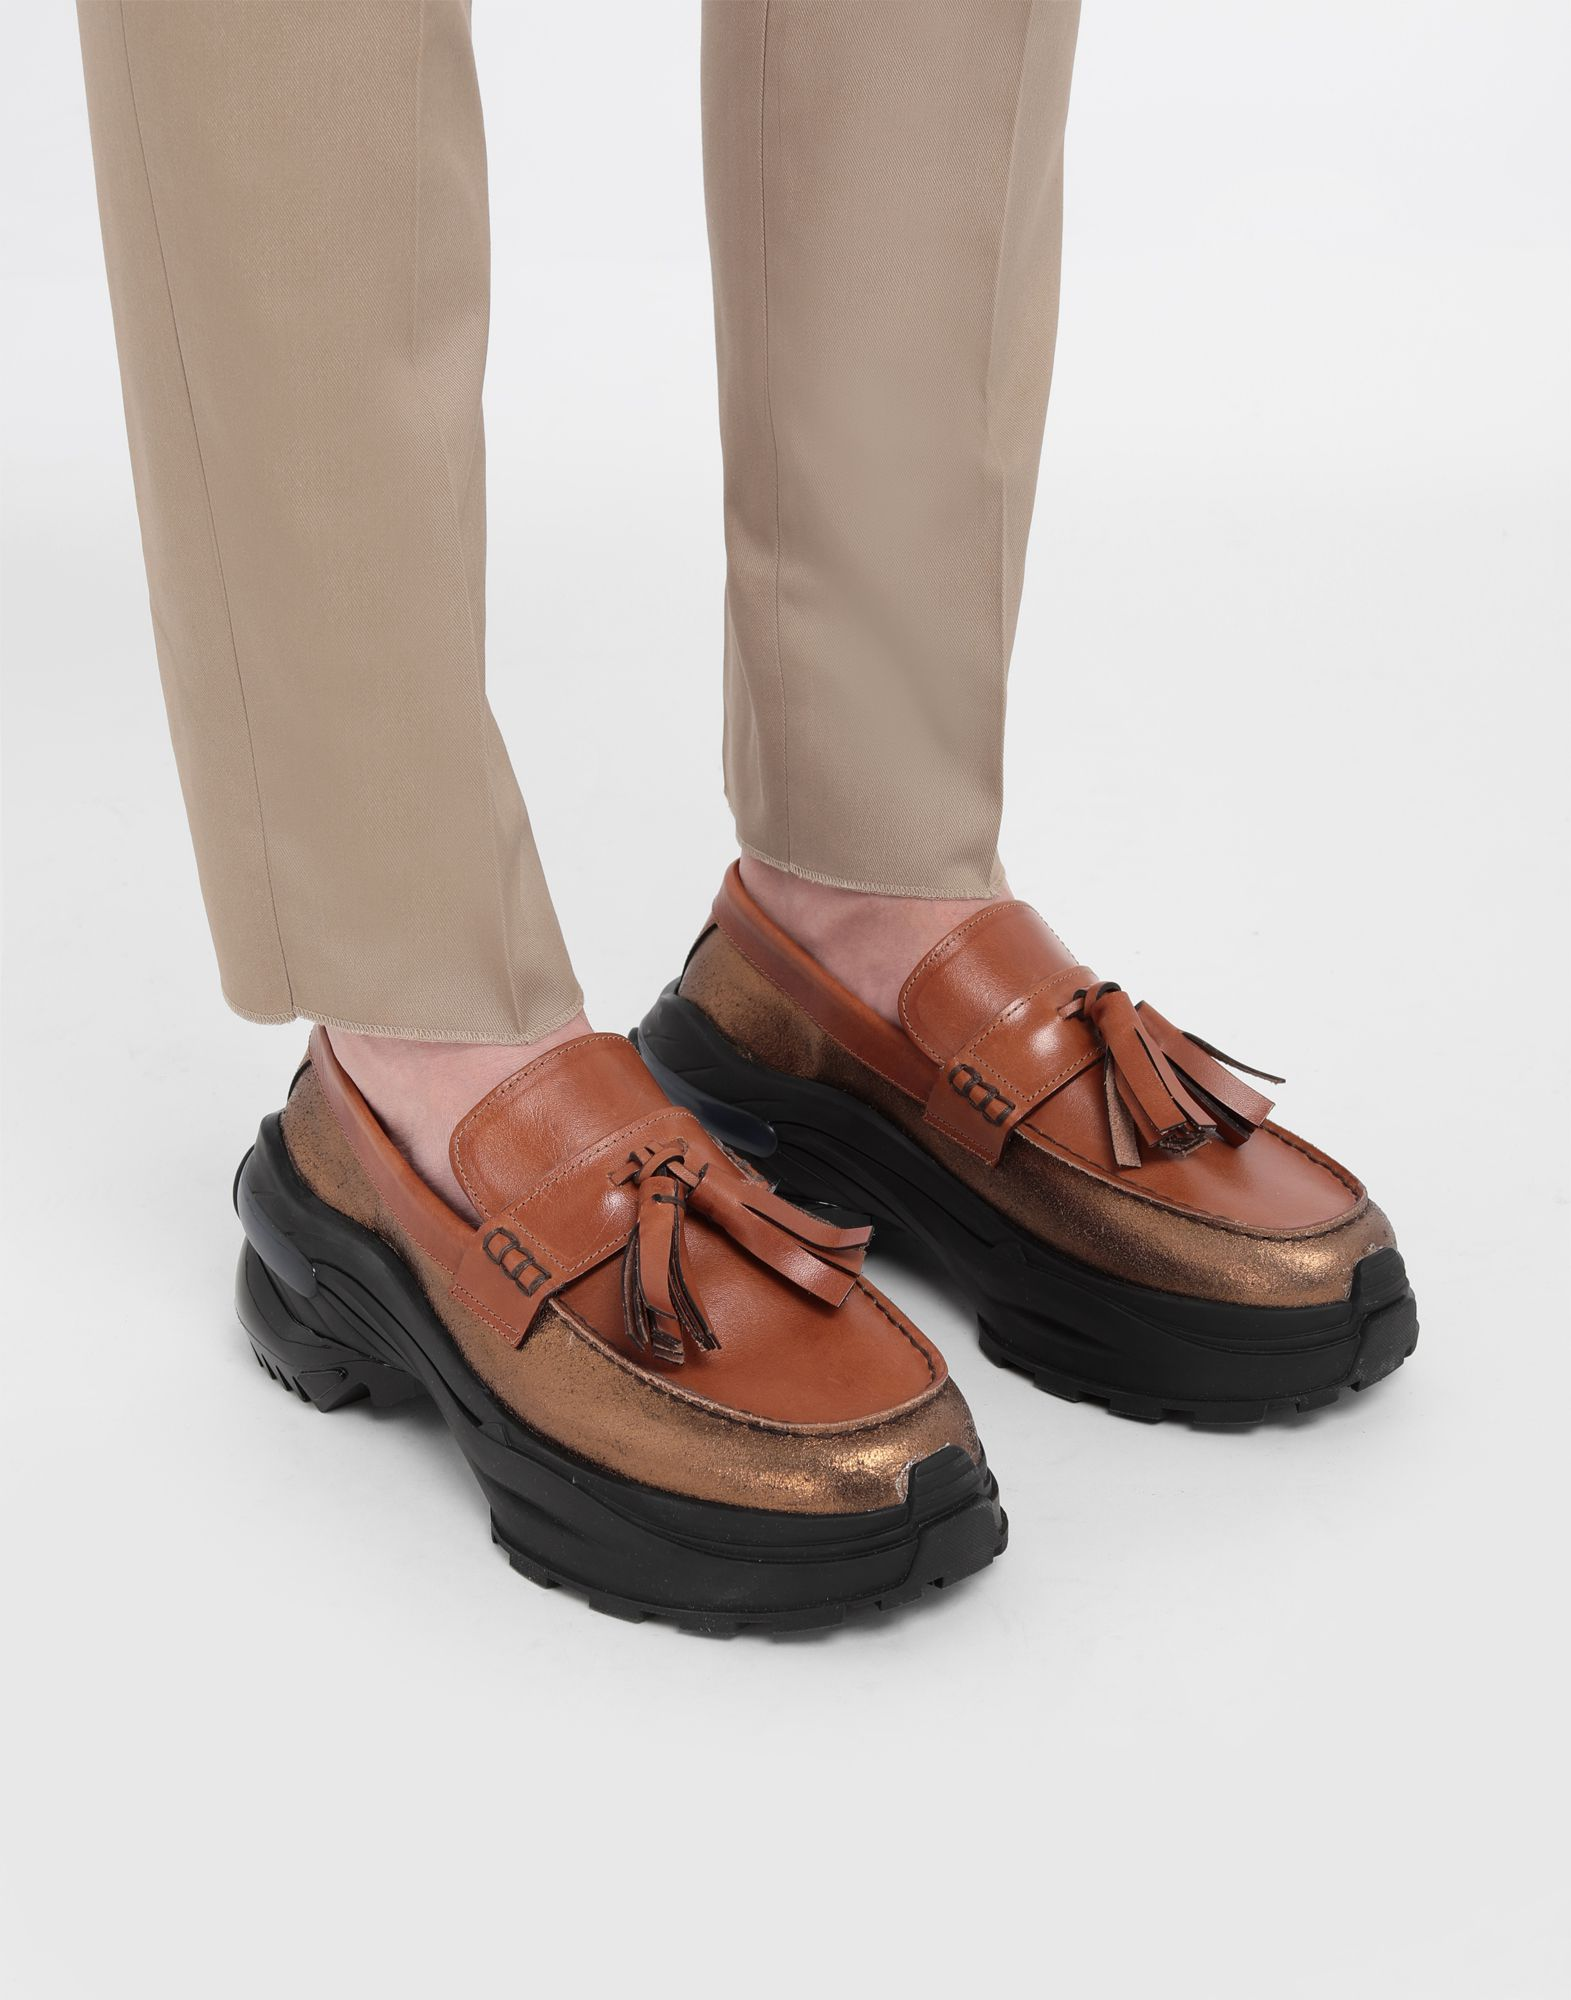 MAISON MARGIELA Gespleißte Sneakers mit Tasselloafer Mokassins Herren b